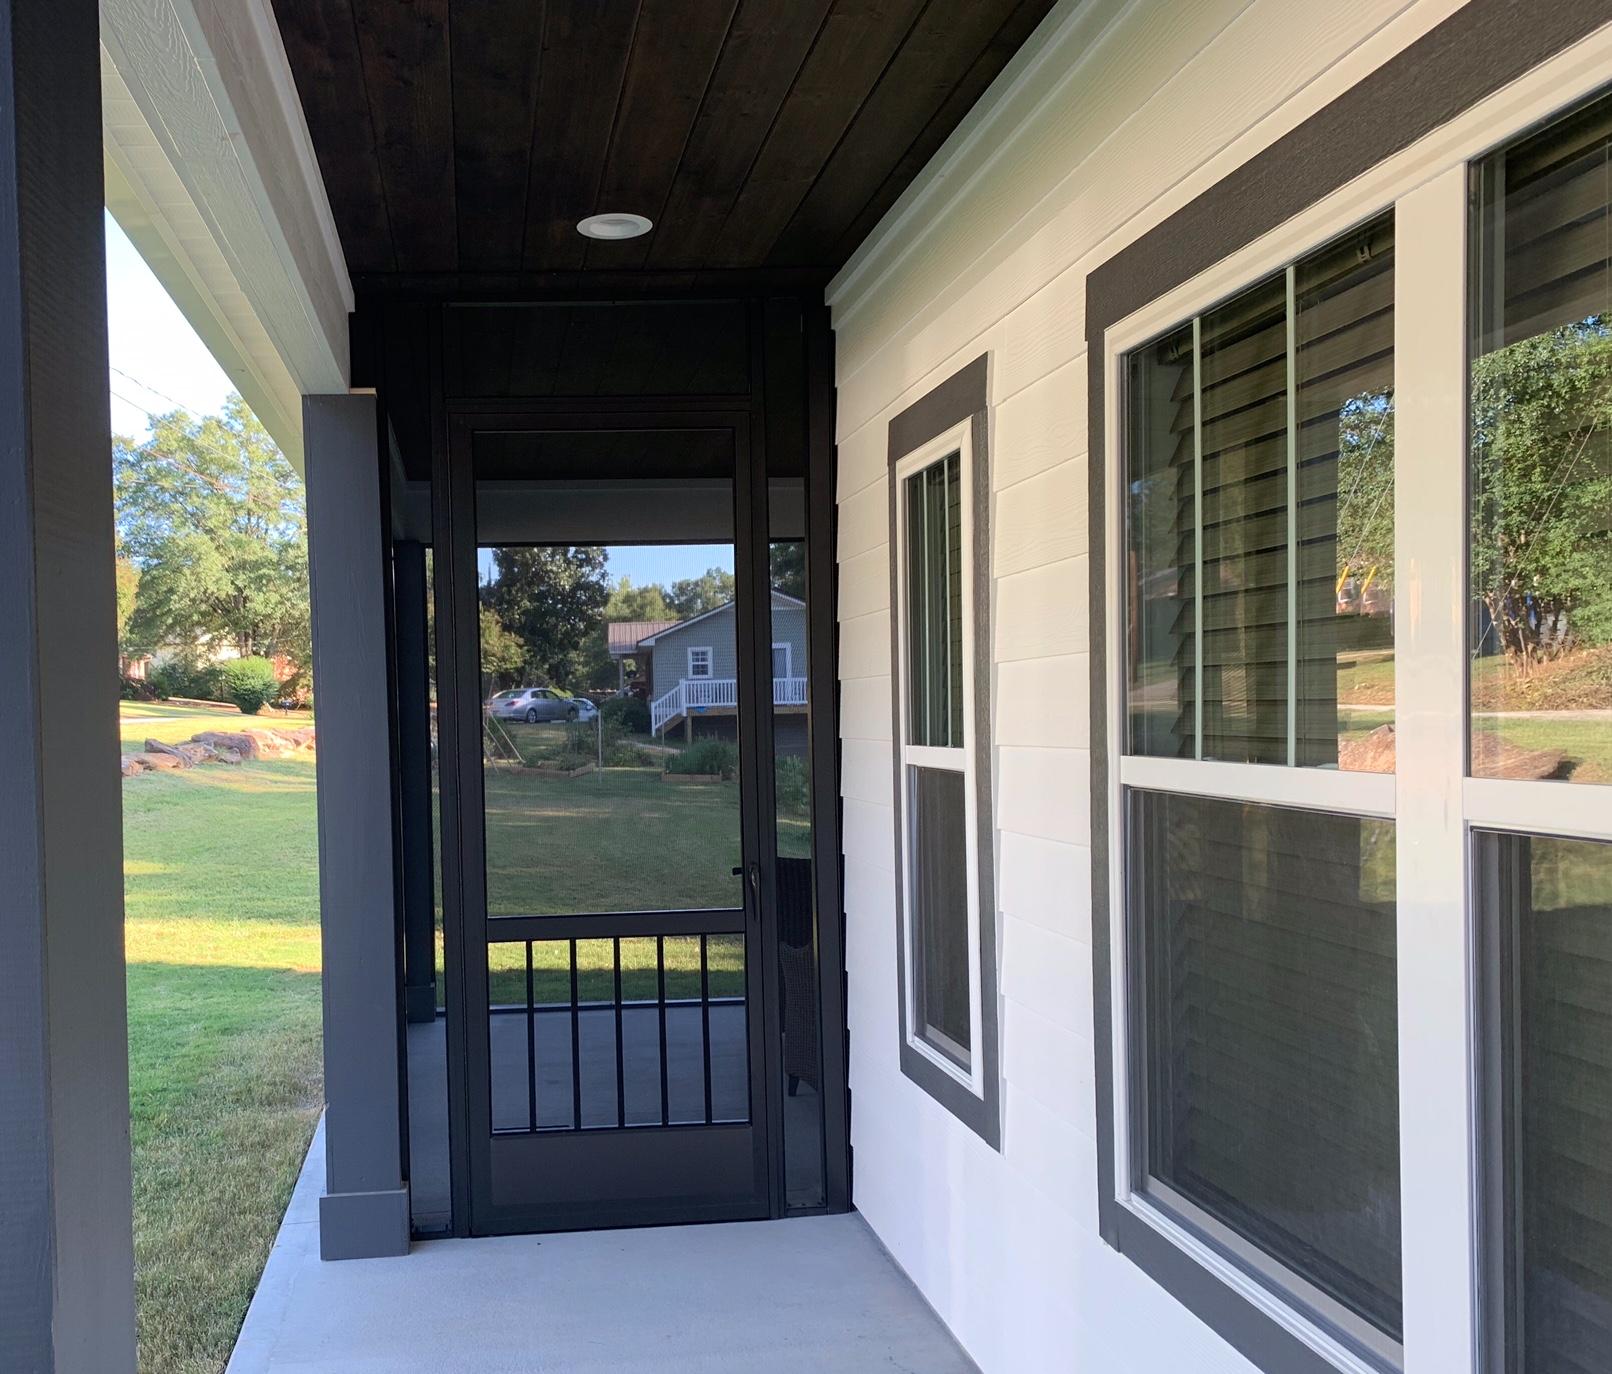 Patio Doors Greenville Sc: Greenville-SC-PCA-8-foot-tall-screen-door-Westmore-model